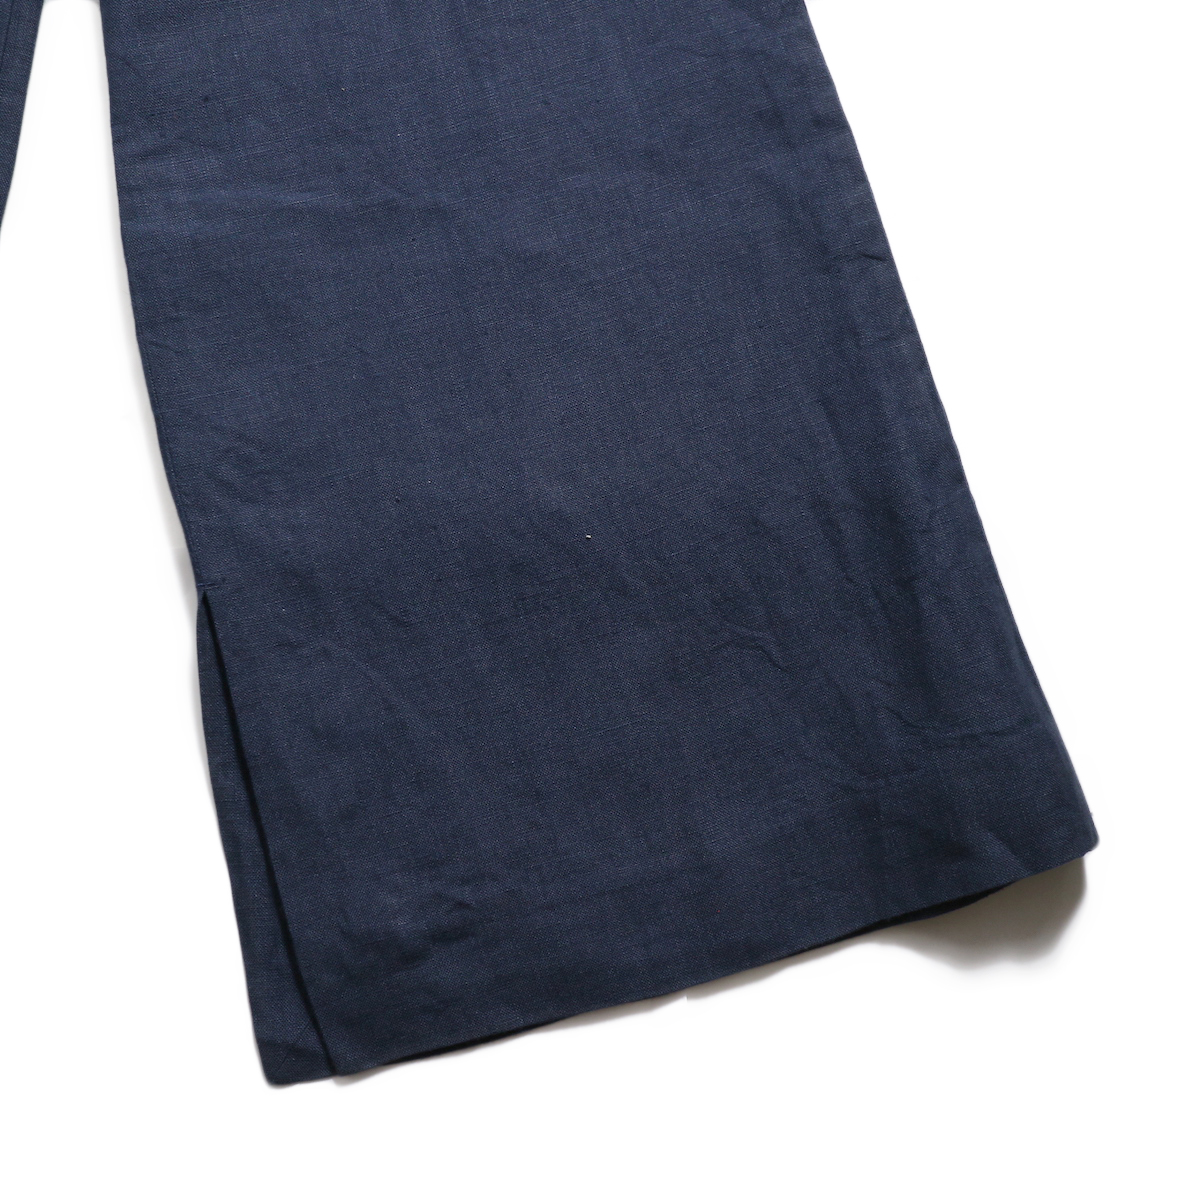 BLUEBIRD BOULEVARD / ウォッシュドリネンワイドパンツ -Navy 裾